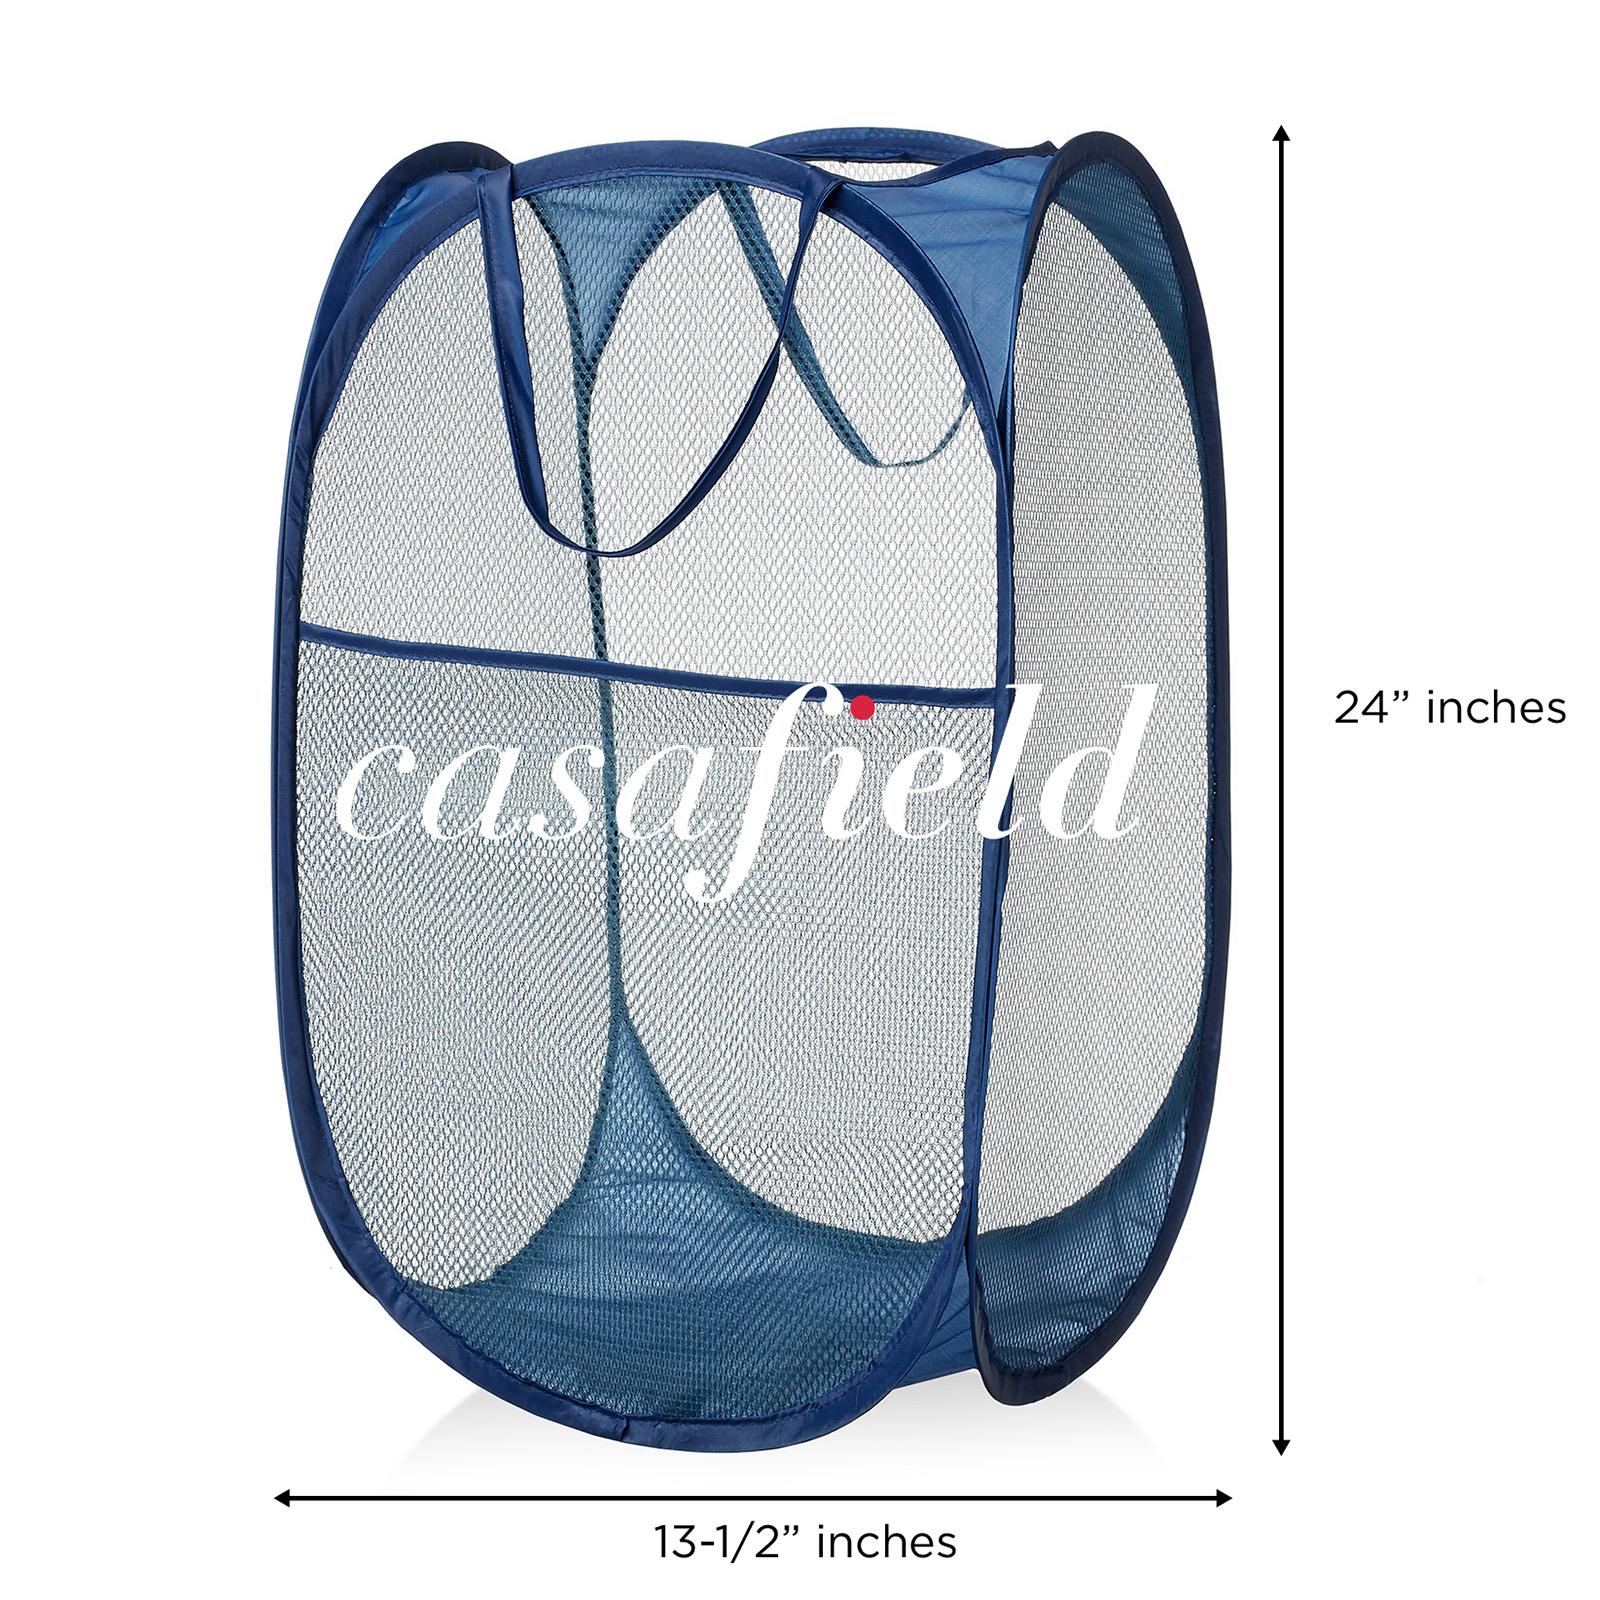 Collapsible Mesh Pop Up Laundry Clothes Hamper Basket